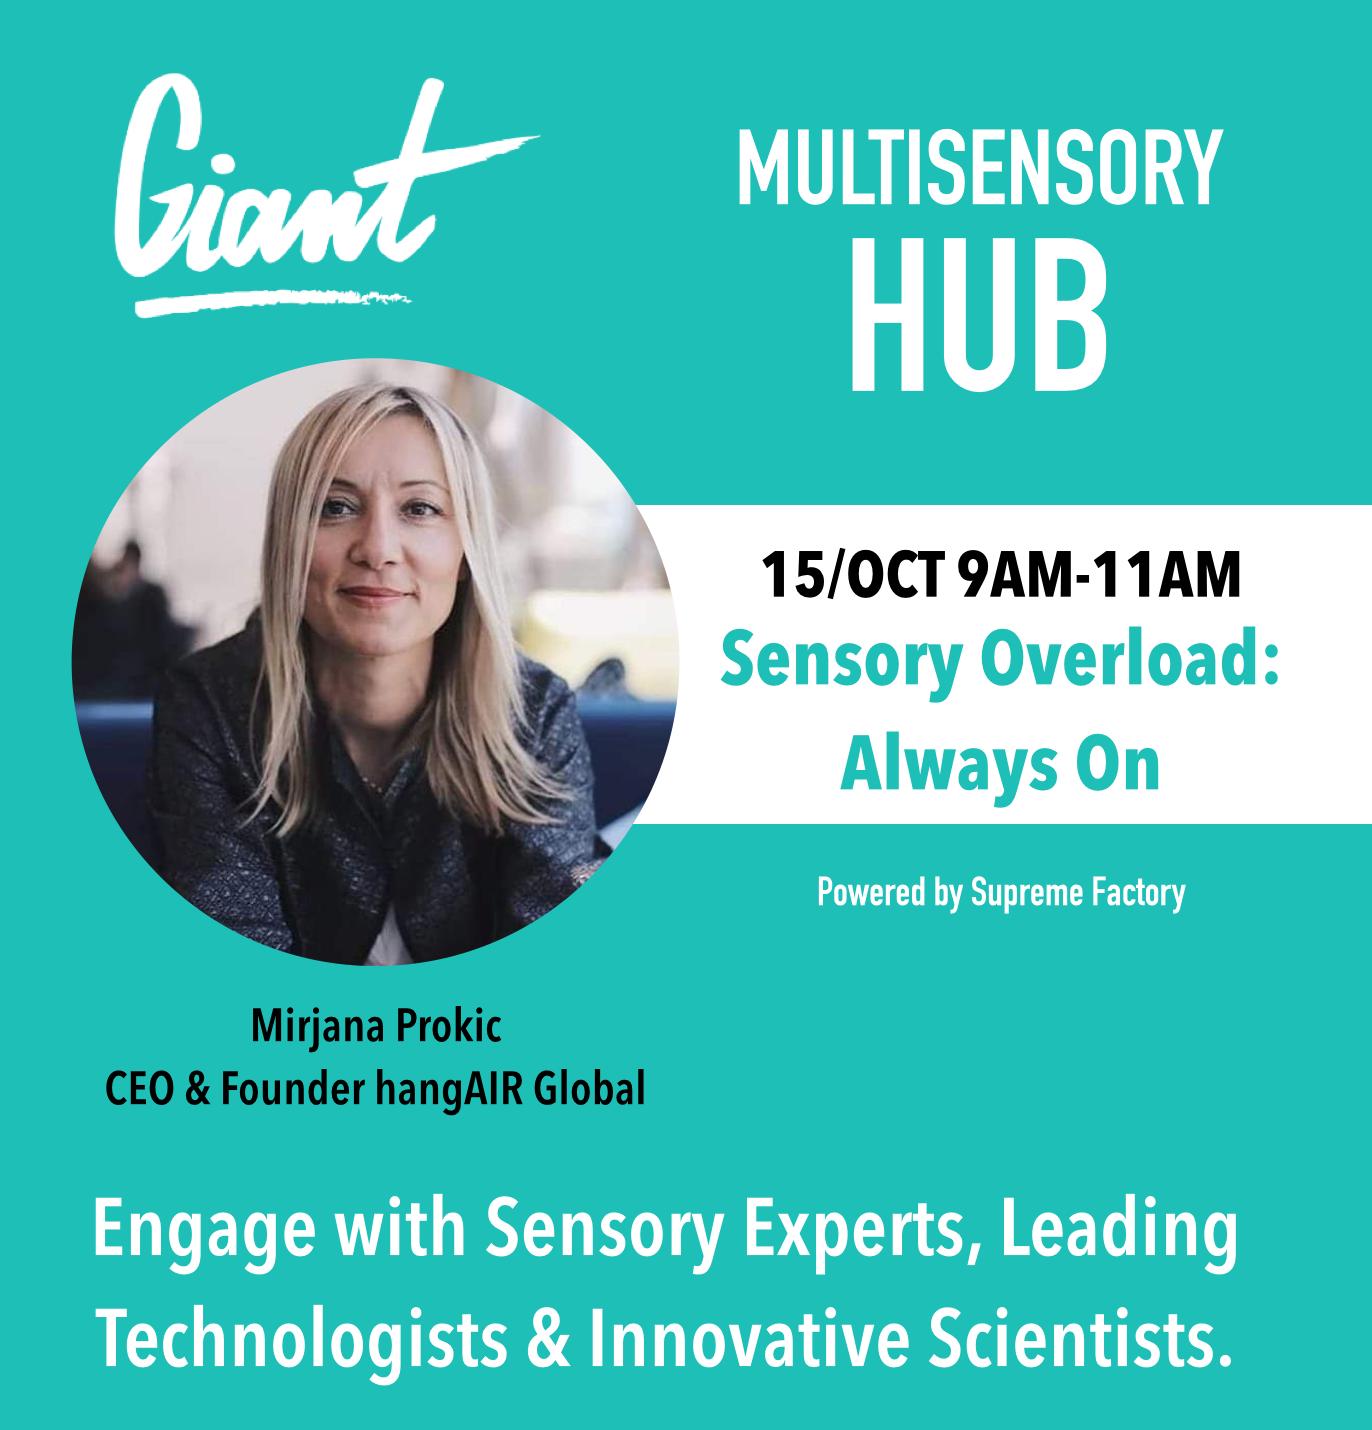 Mirjana Prokic, HealthTech Entrepreneur CEO & Founder HangAir Global